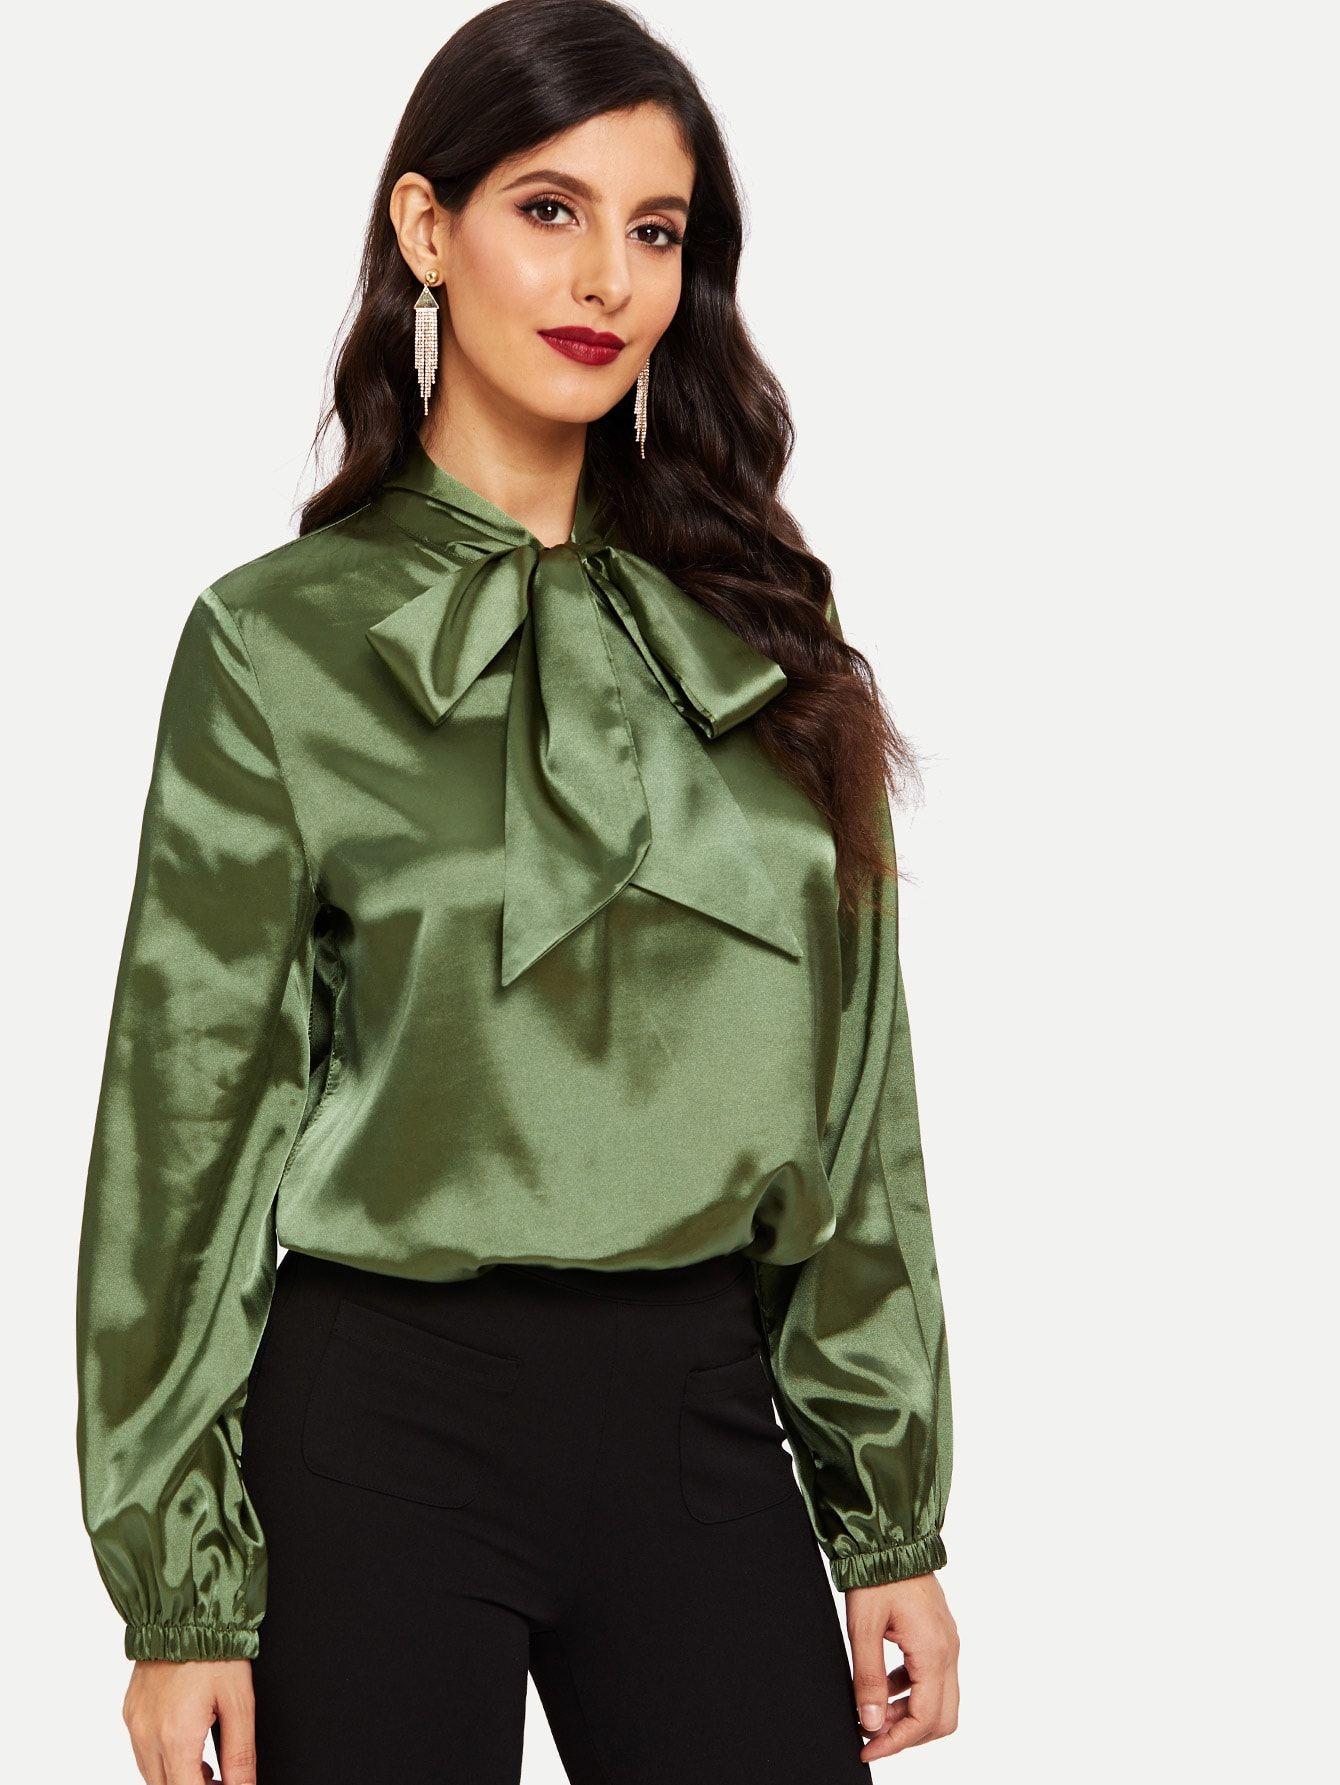 b0f1b89102078b Elegant Tie Neck Plain Top Regular Fit Stand Collar Long Sleeve Pullovers  Army Green Regular Length Tie Neck Solid Top